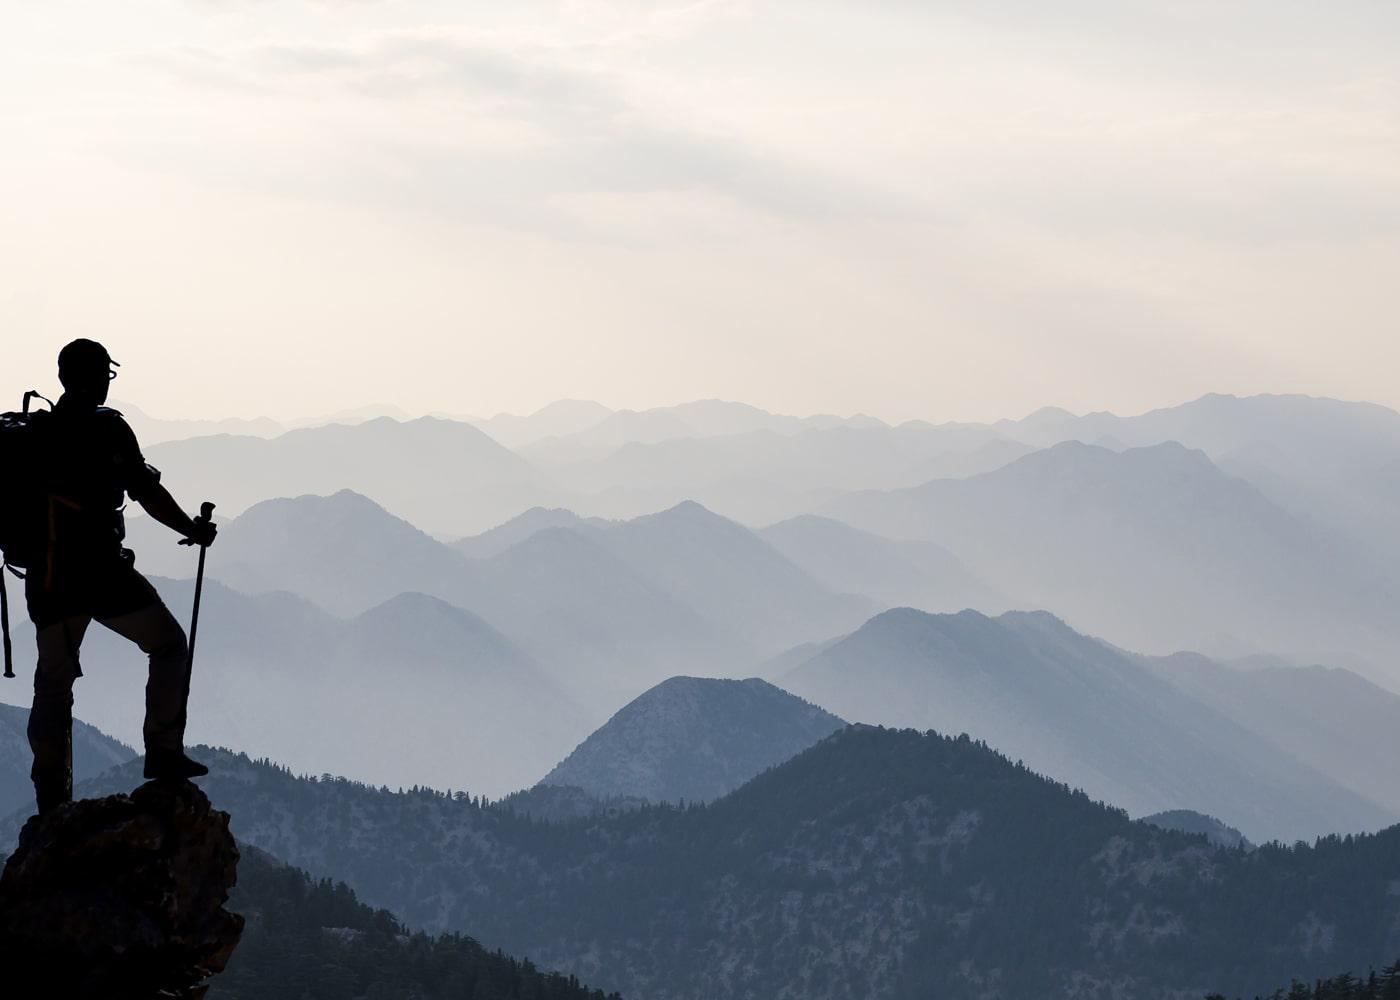 naem-2018-blog-alone-summit-climber-successful-climbers-700x500